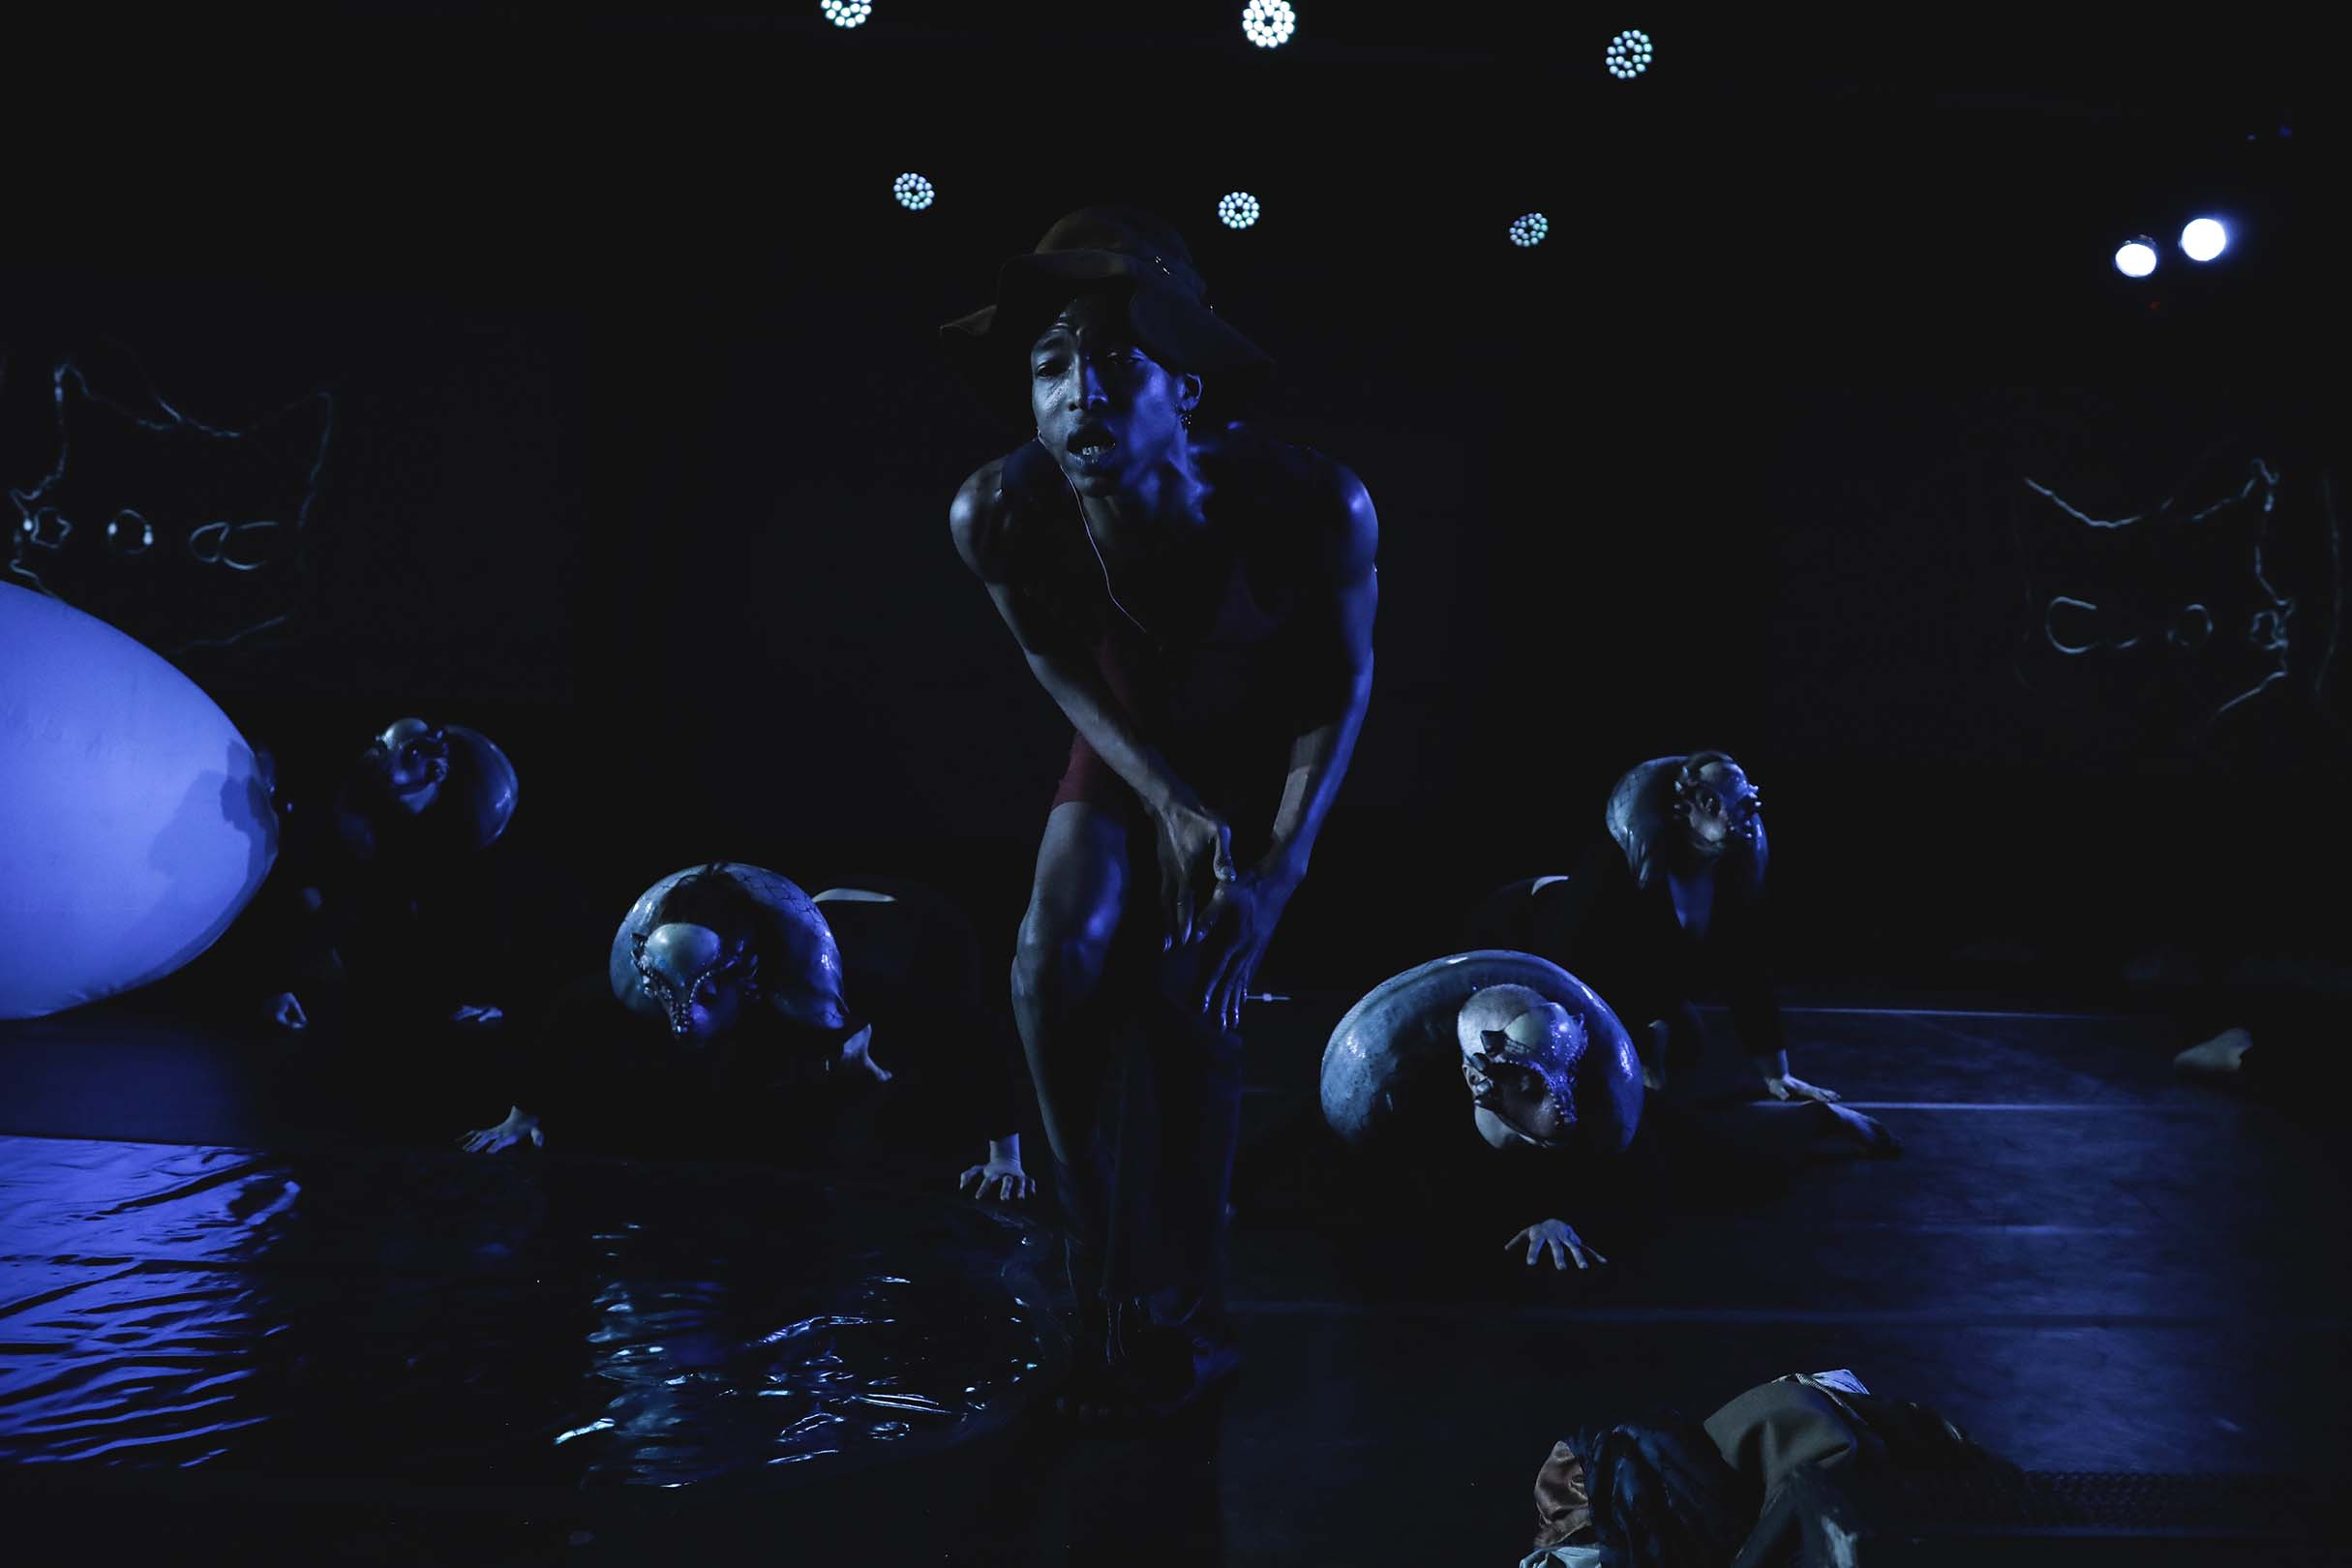 people dancing under blue light